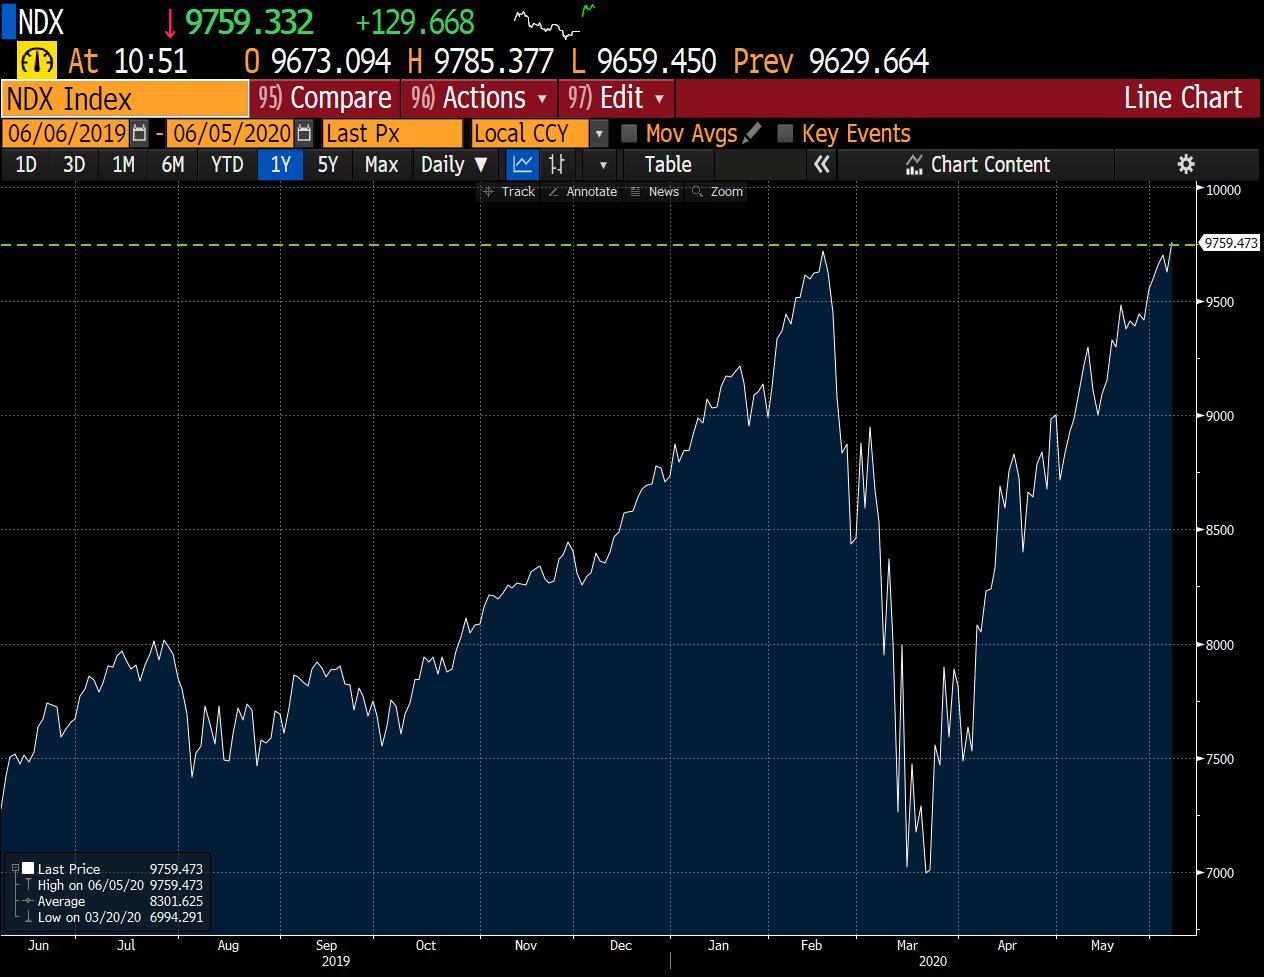 NASDAQ v-shapd rcovery